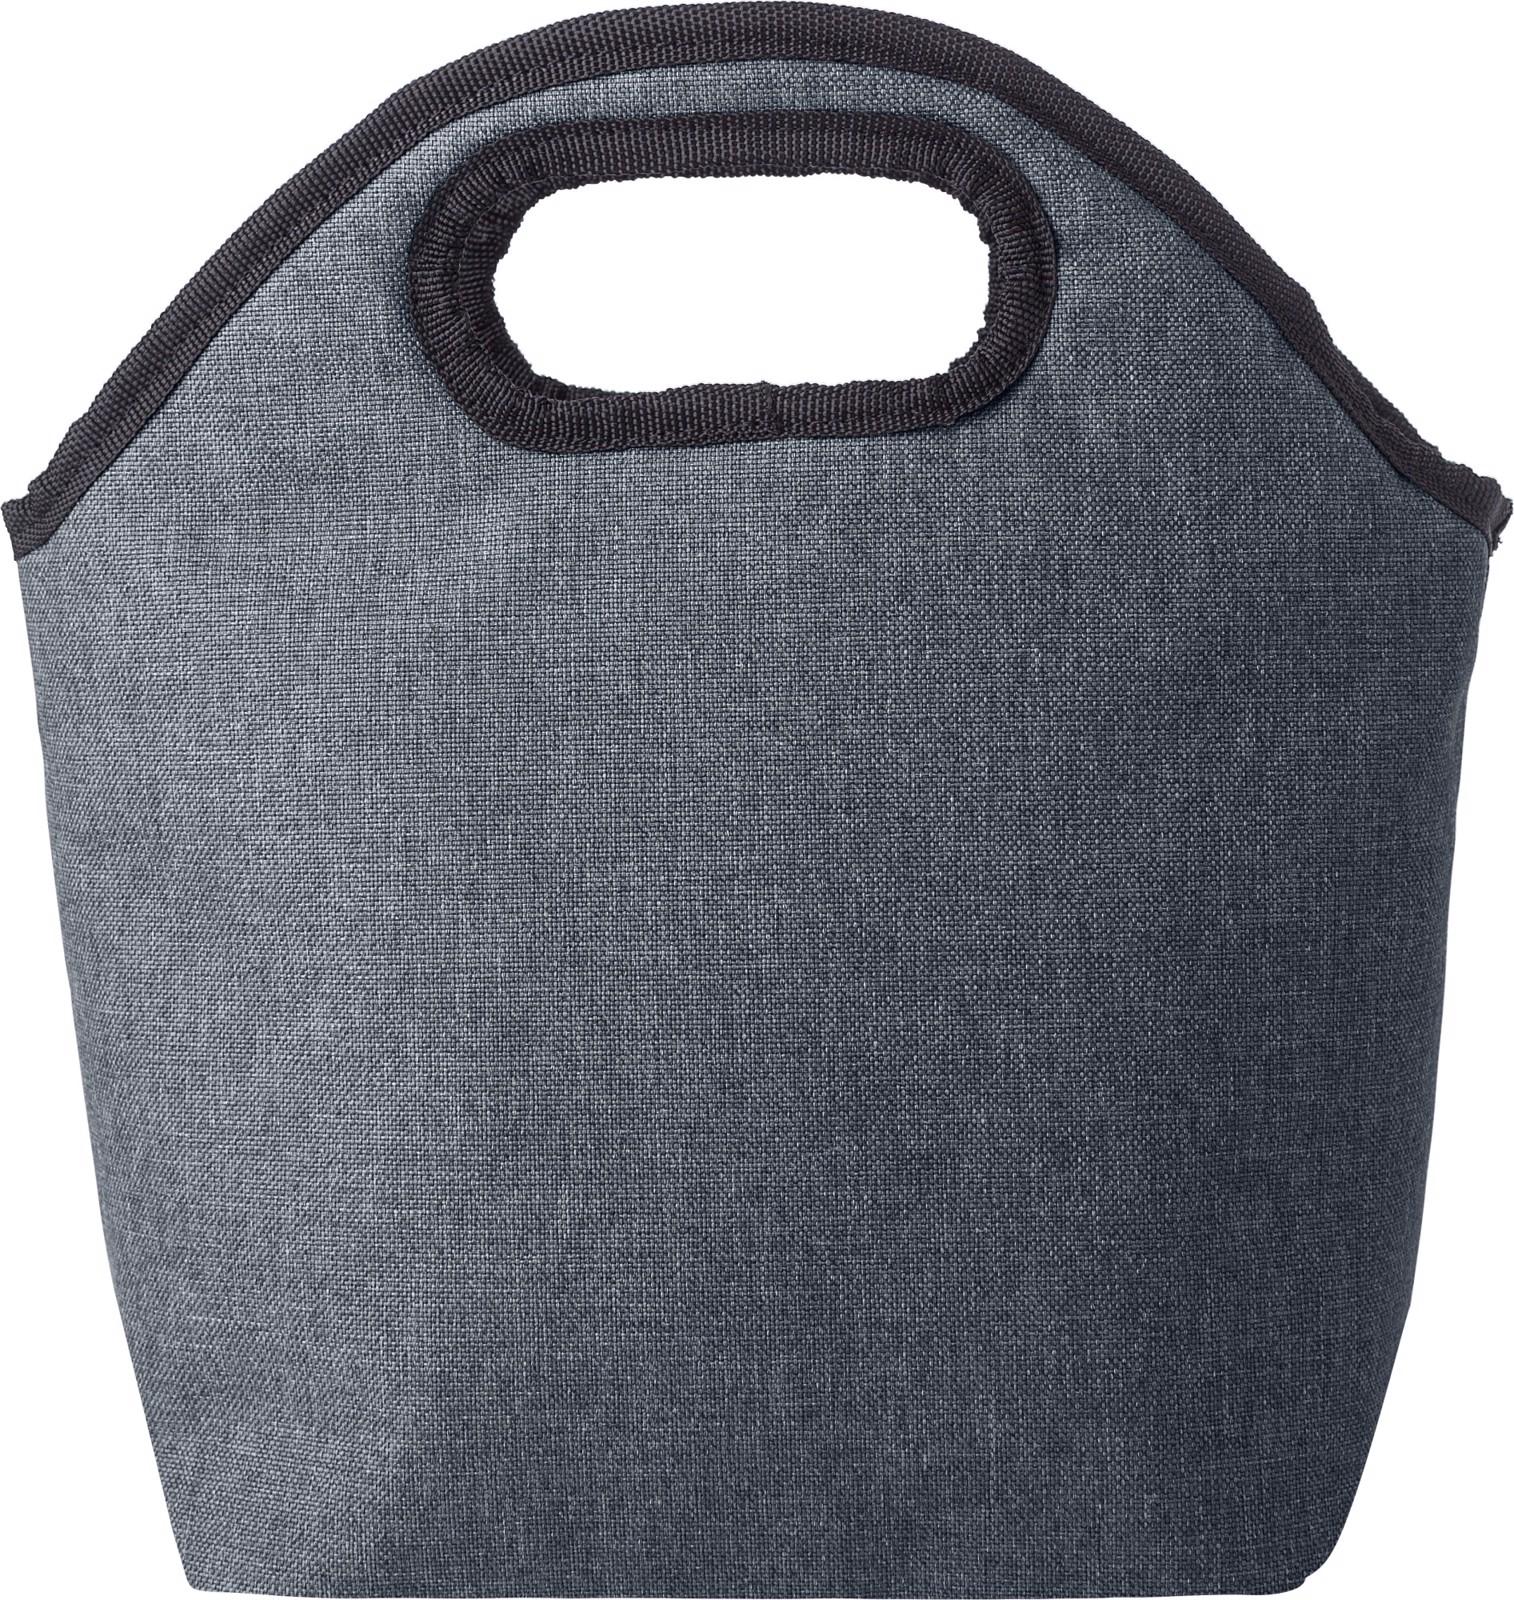 Polycanvas (600D) cooler bag - Black